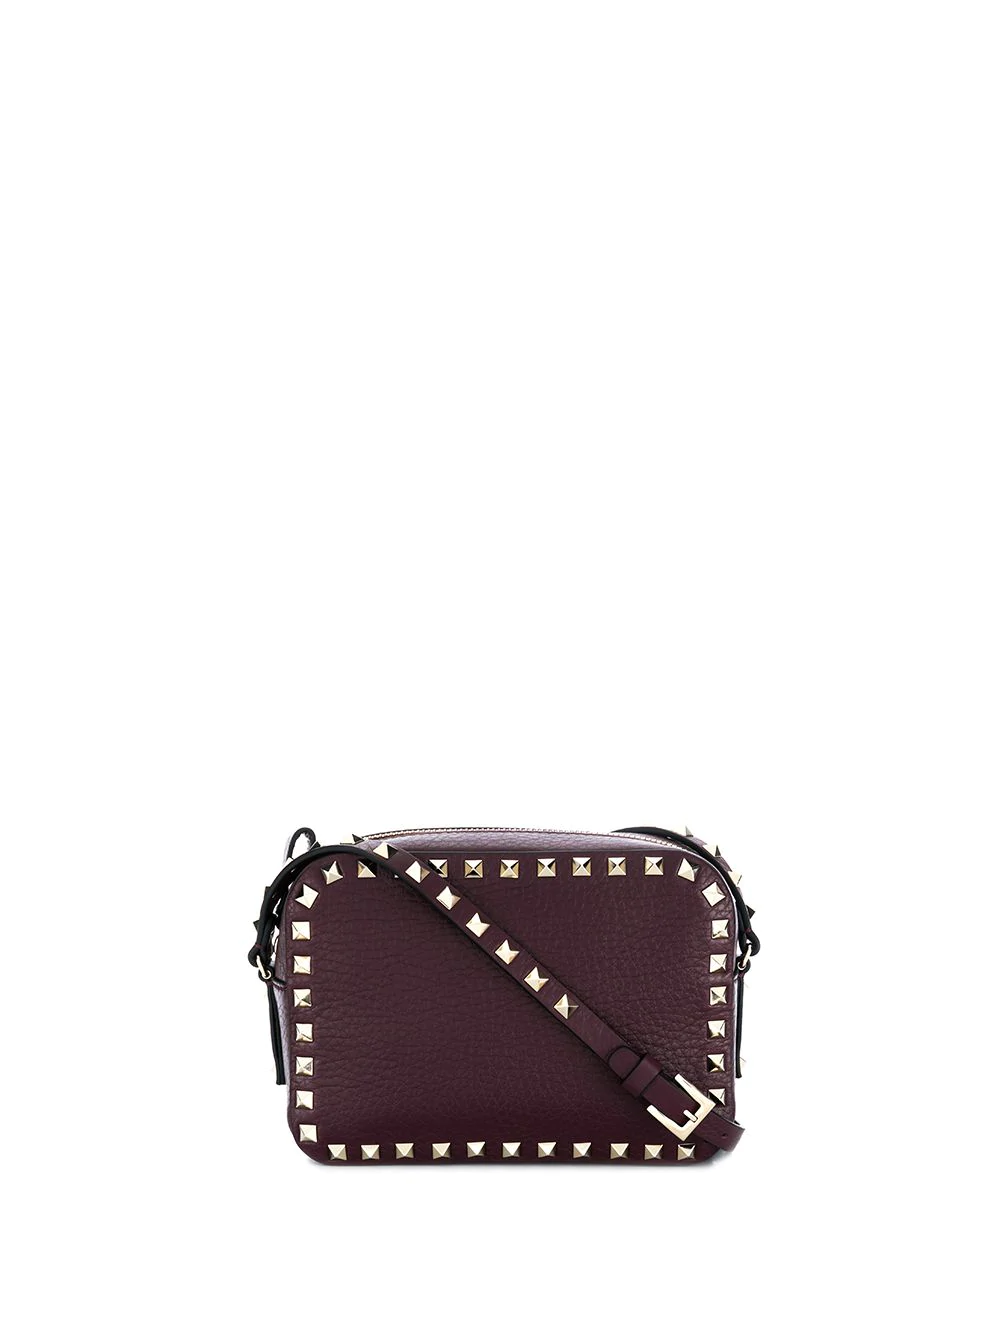 0b67fdf22c Valentino Garavani Rockstud Camera Crossbody Bag - Purple | ModeSens